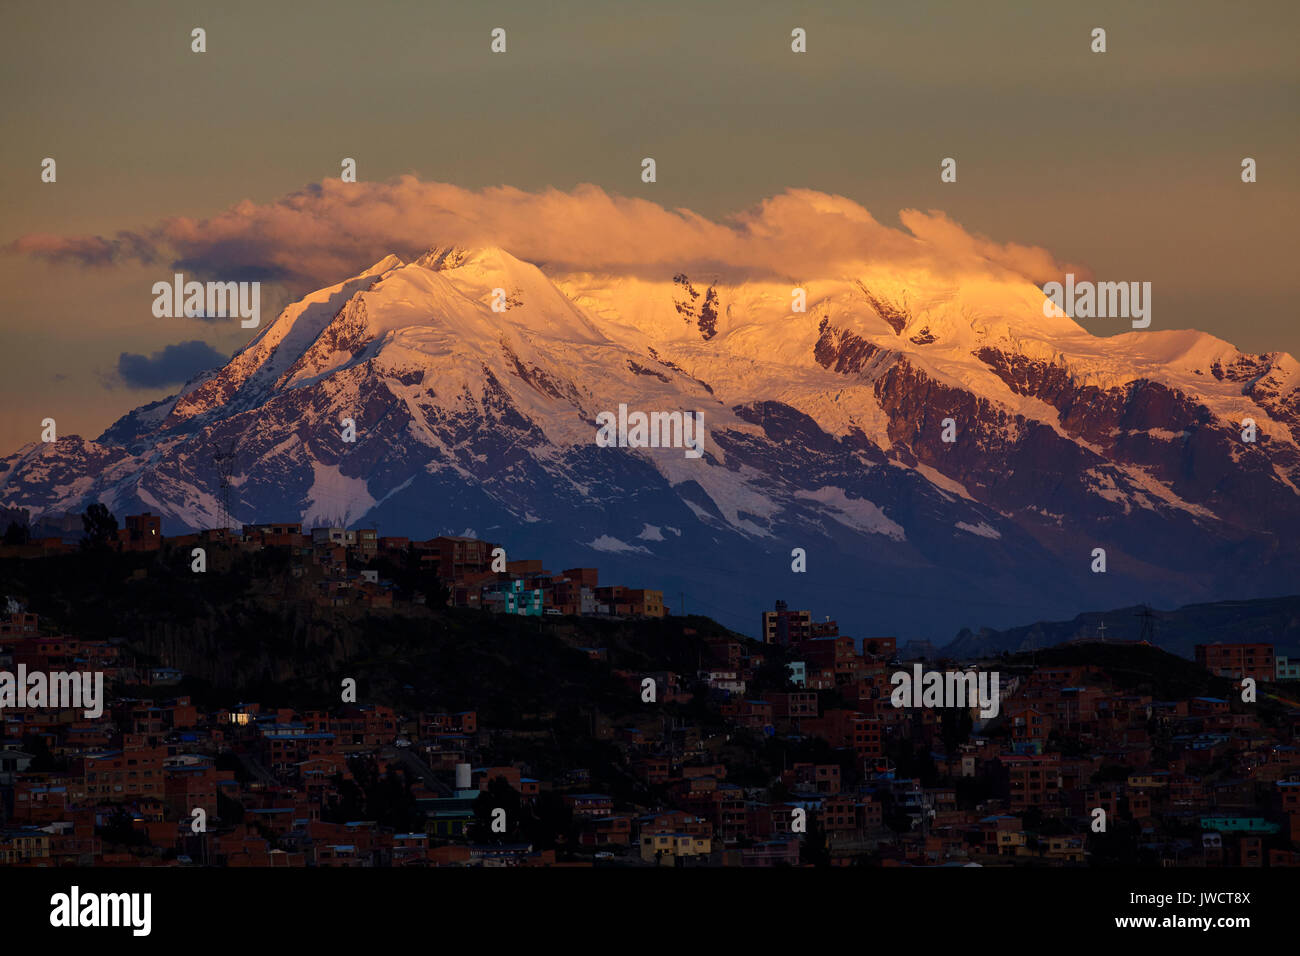 Sunset on Illimani (6438m/21,122ft), La Paz, Bolivia, South America - Stock Image